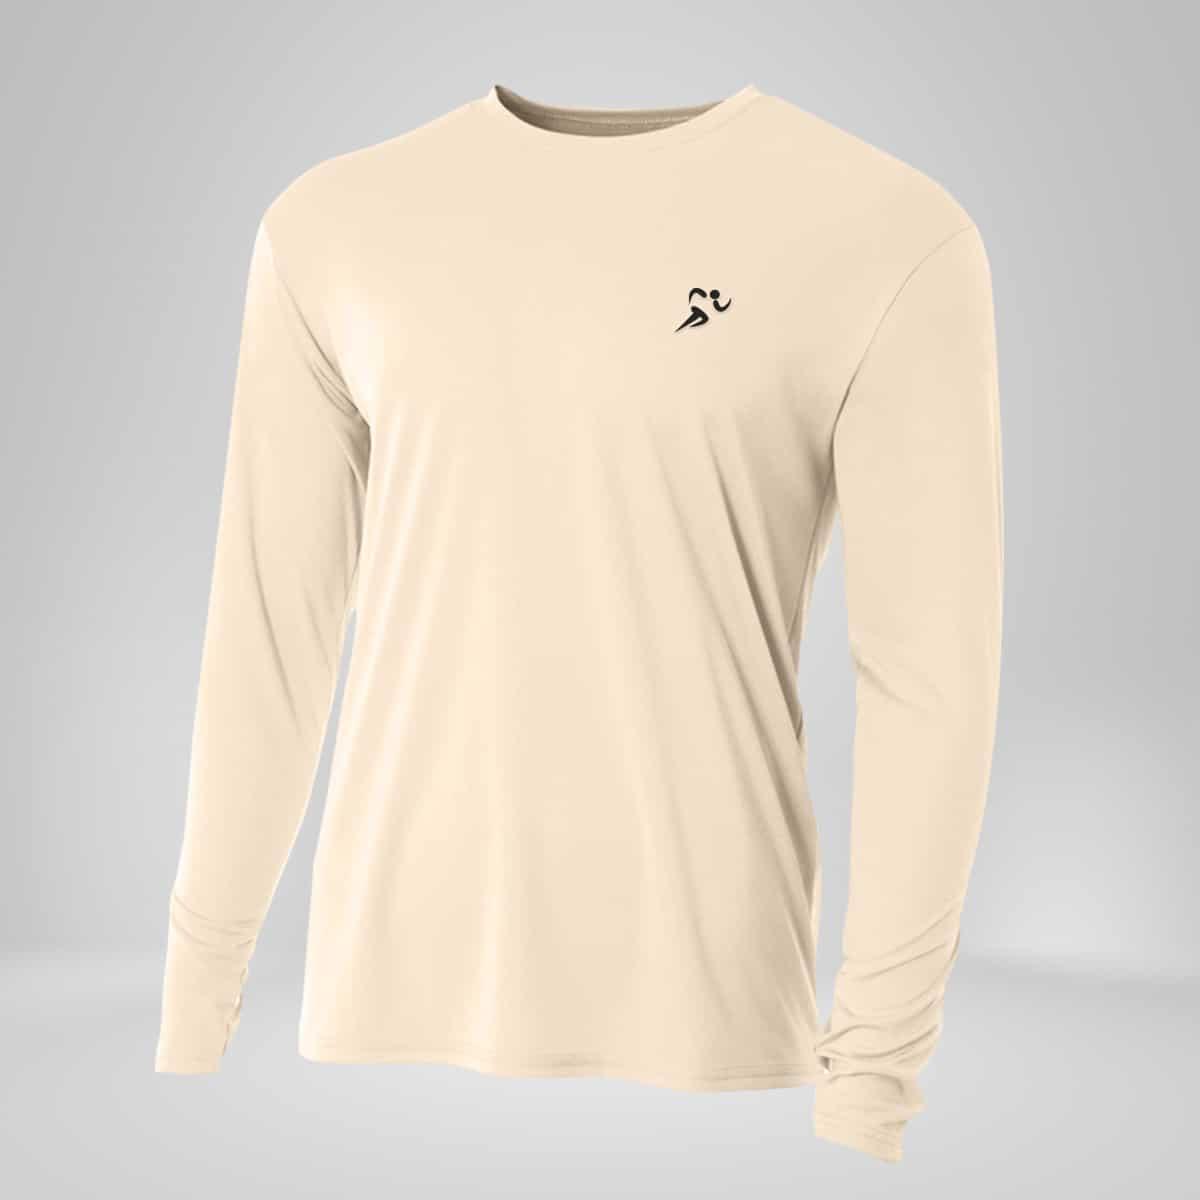 copper fabric long sleeve shirt white